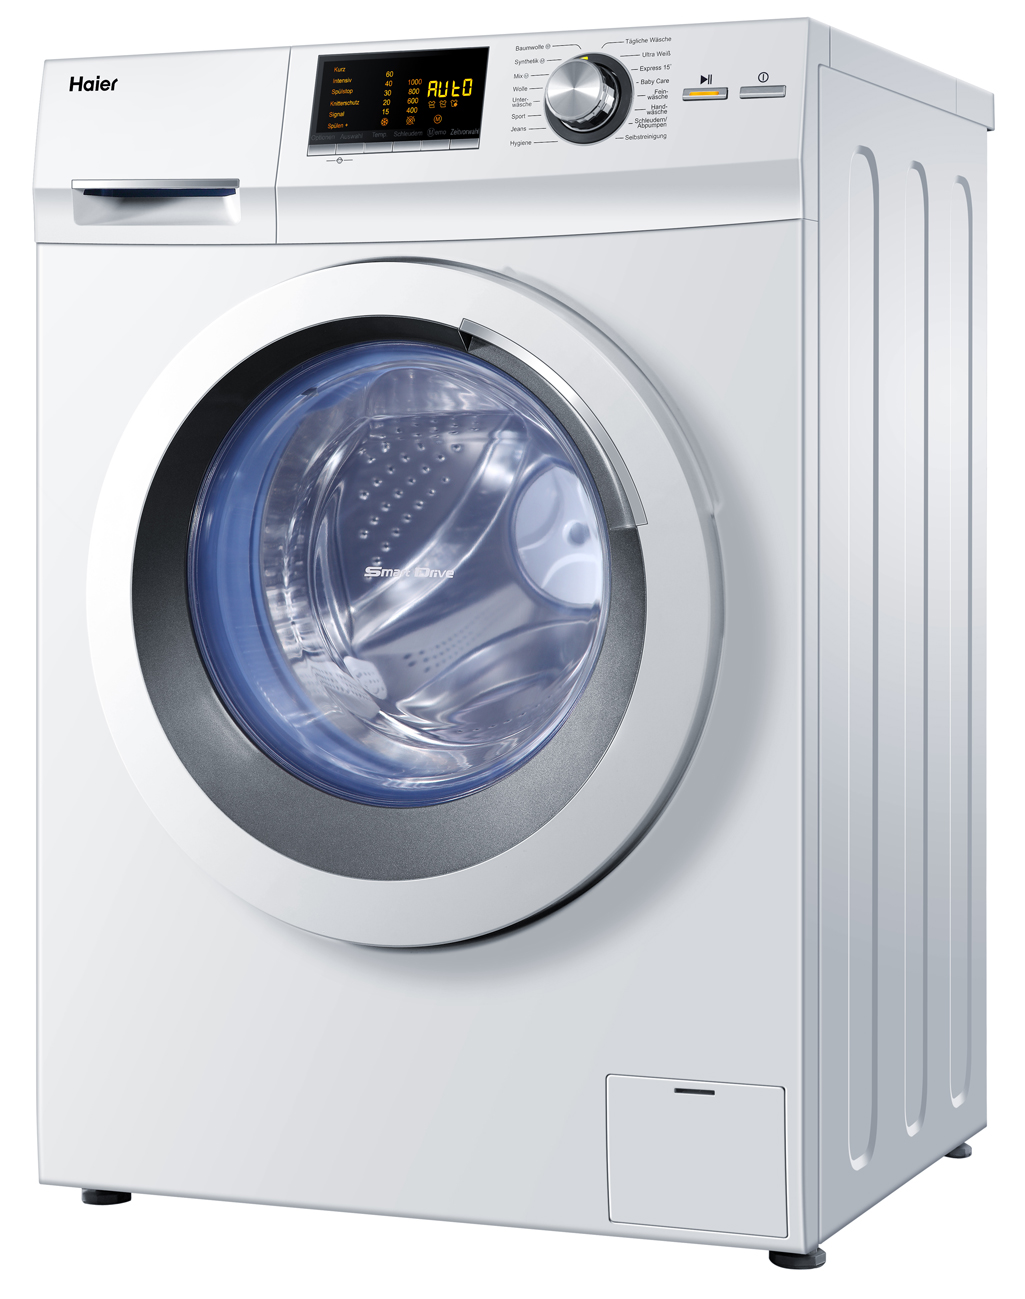 waschmaschine funktion m bel design idee f r sie. Black Bedroom Furniture Sets. Home Design Ideas